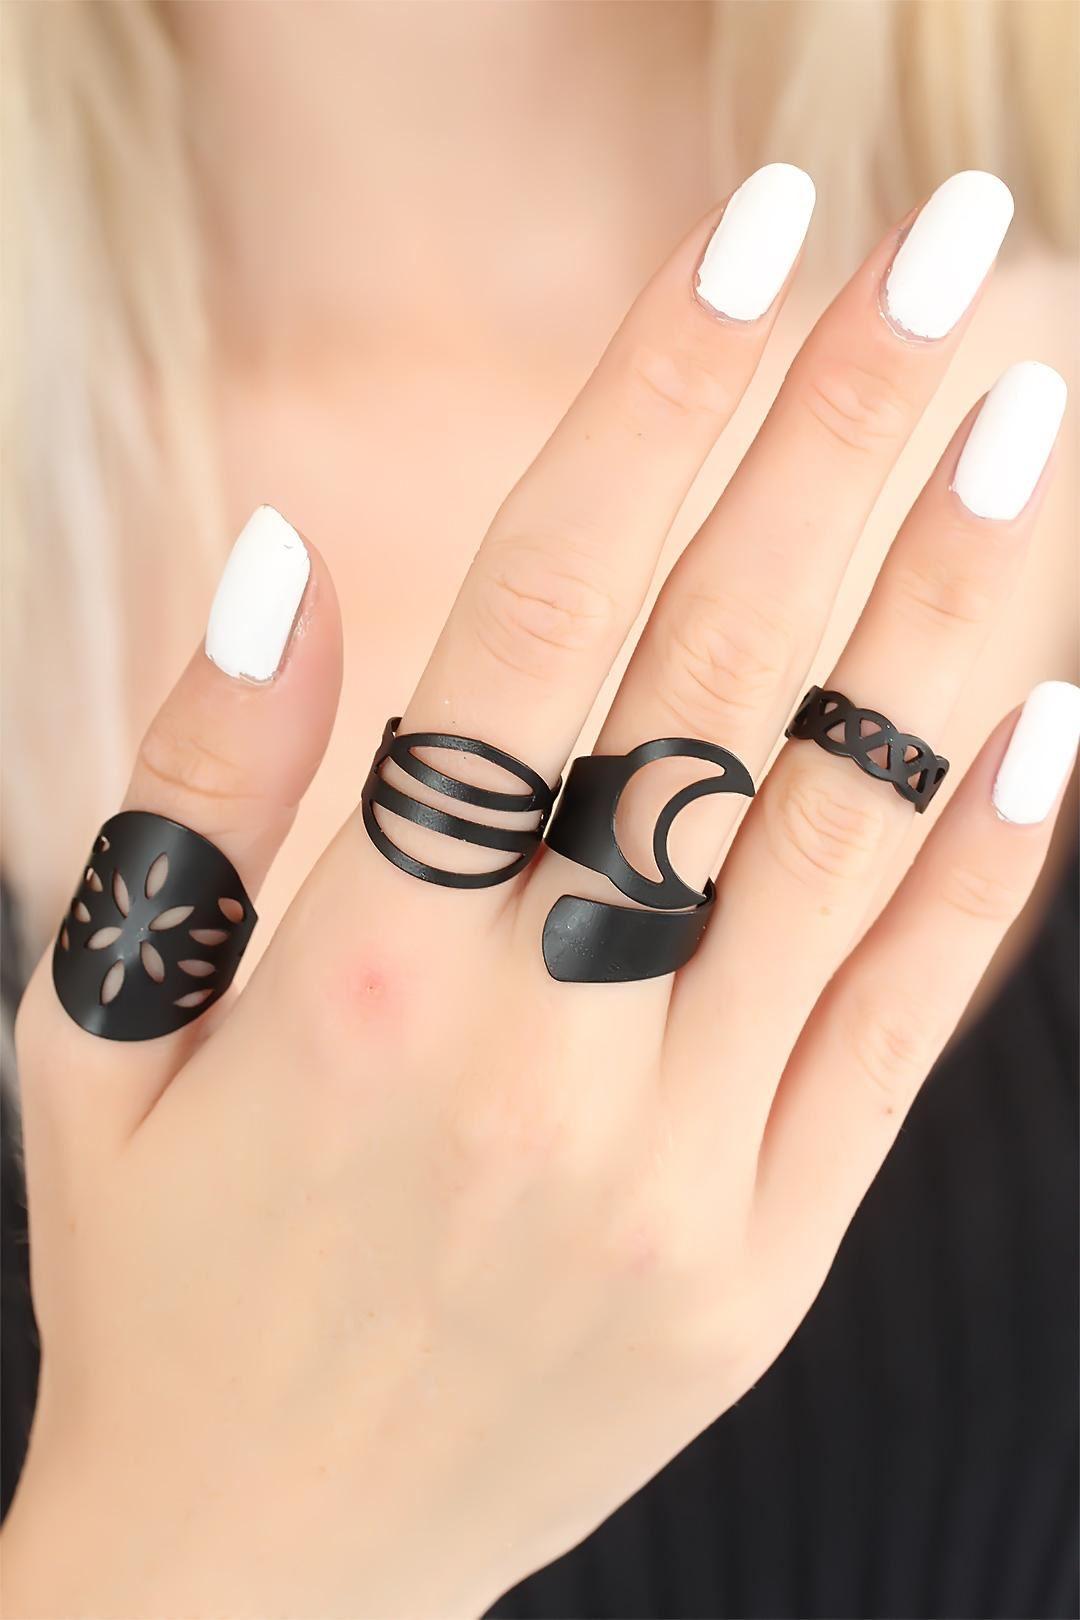 Siyah Renk Bayan Yüzük Seti